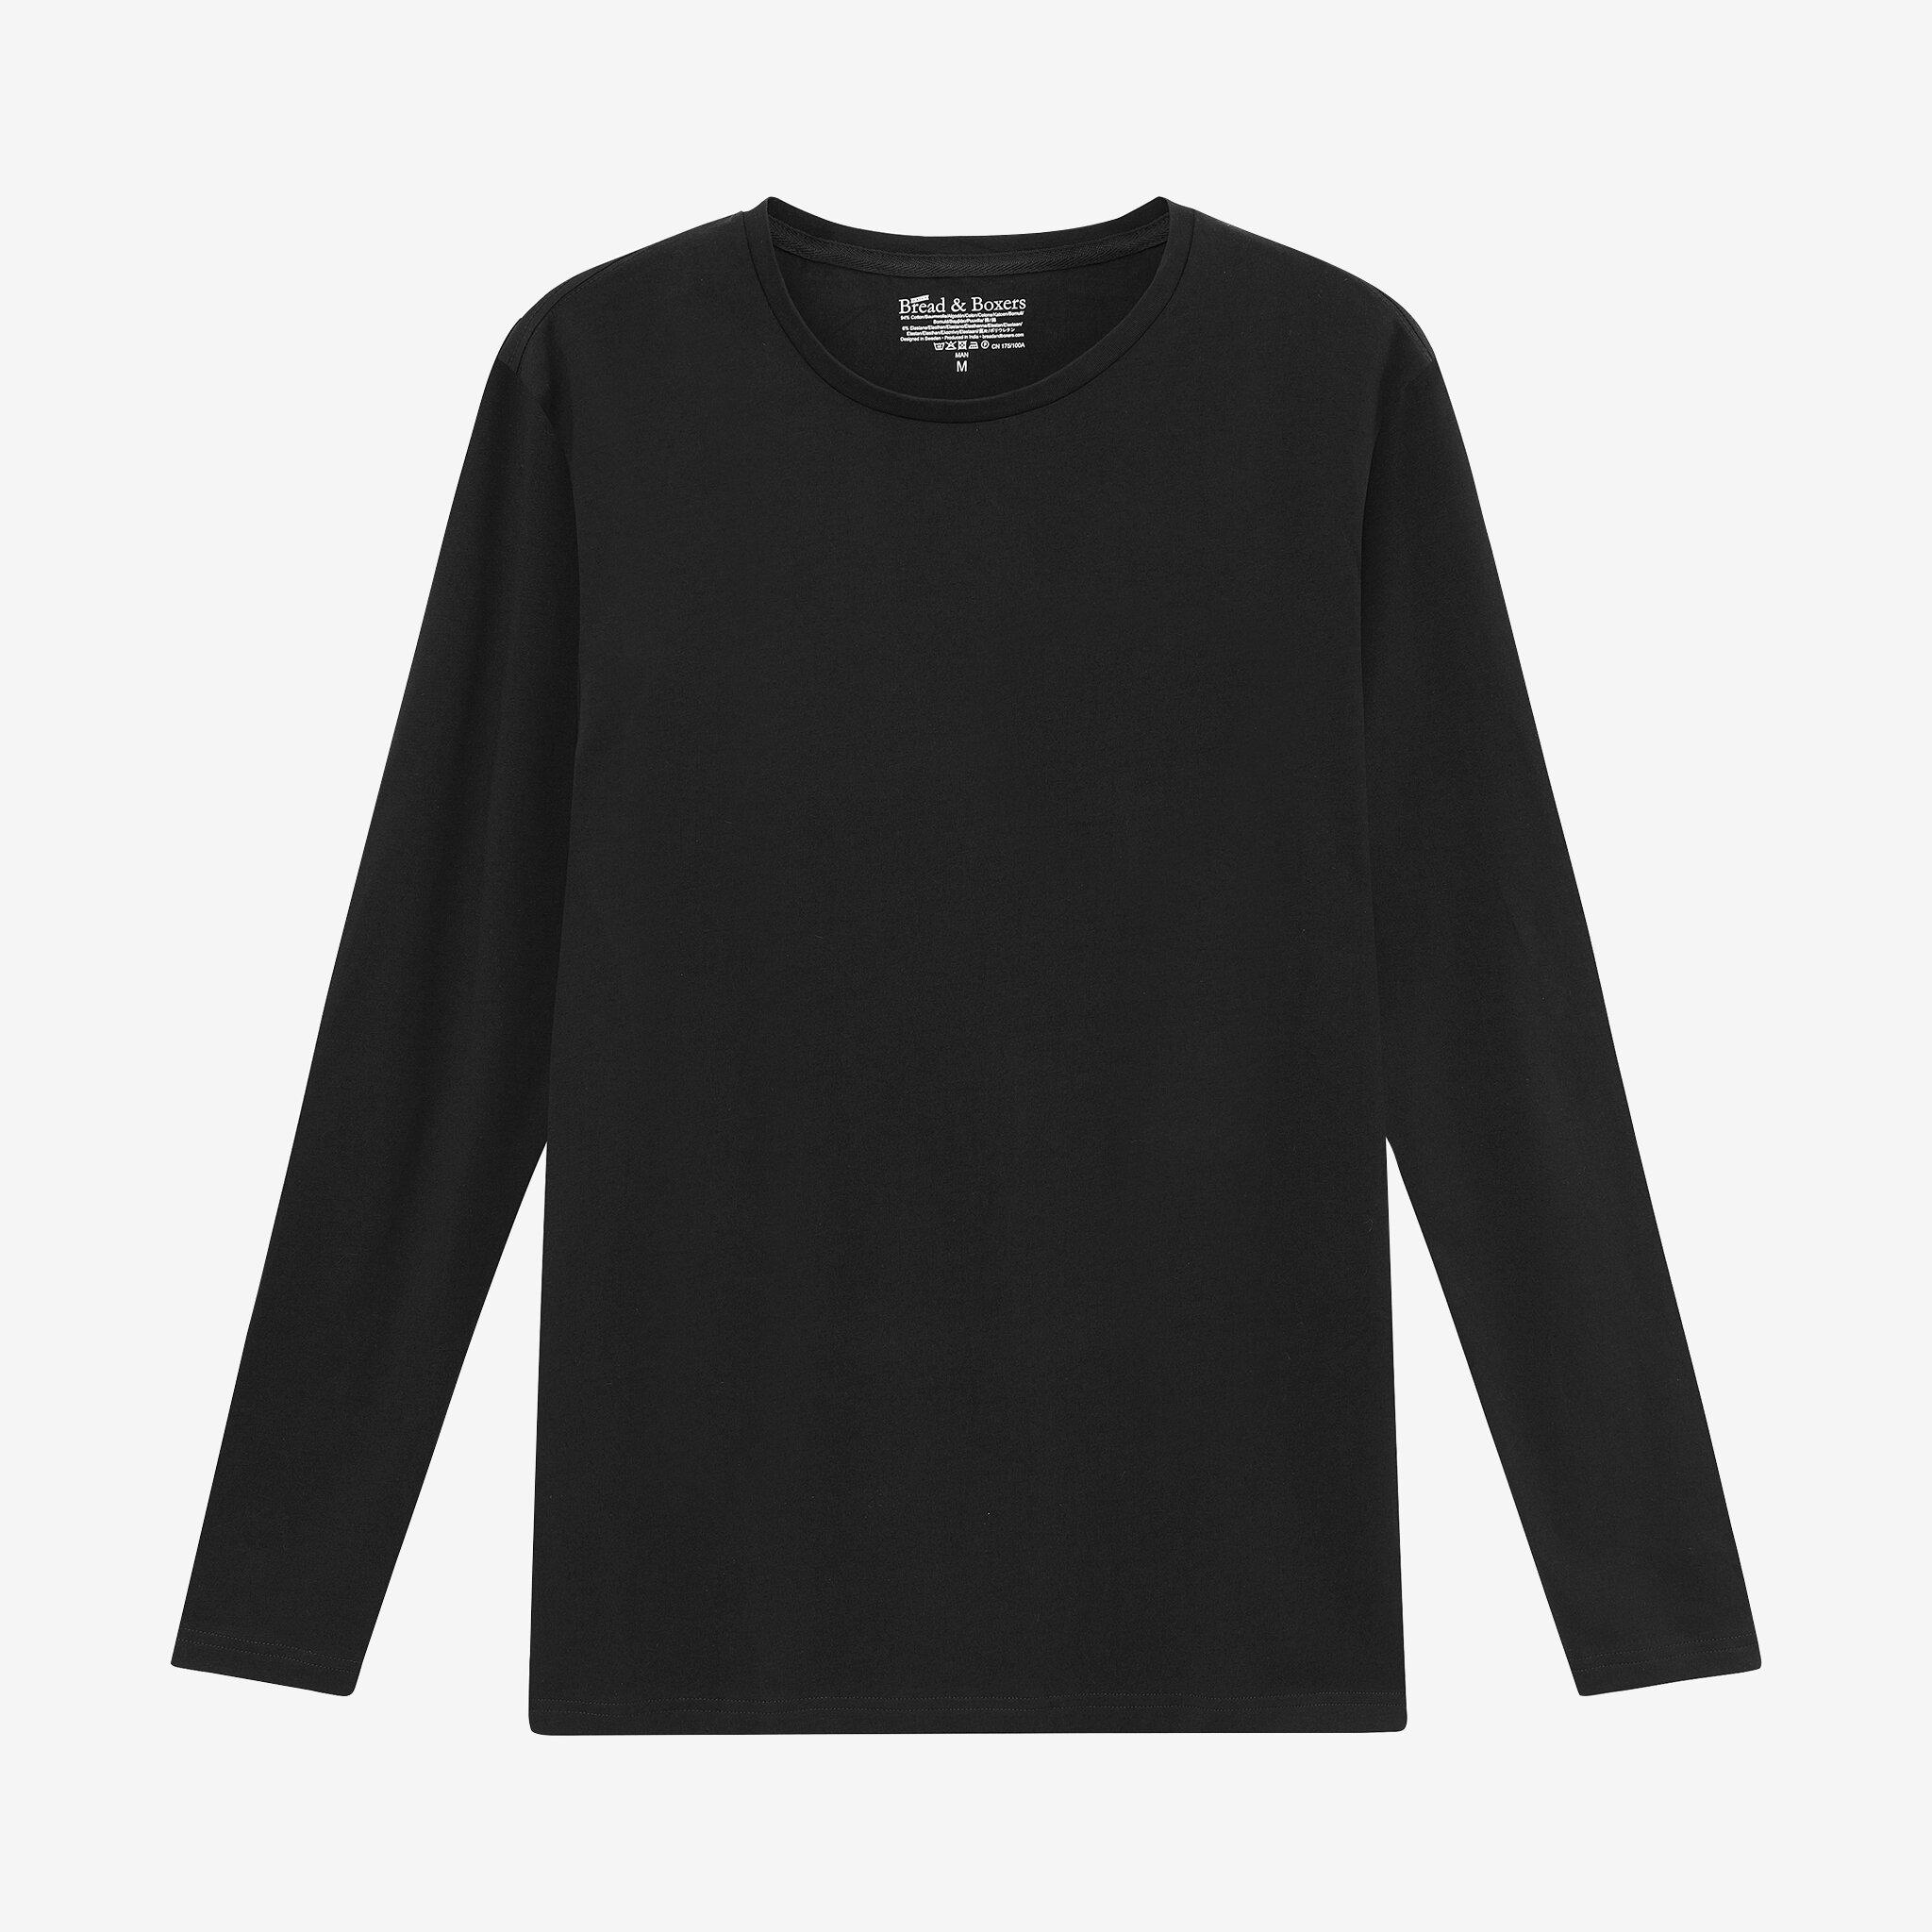 116202_Man_Long Sleeve_black